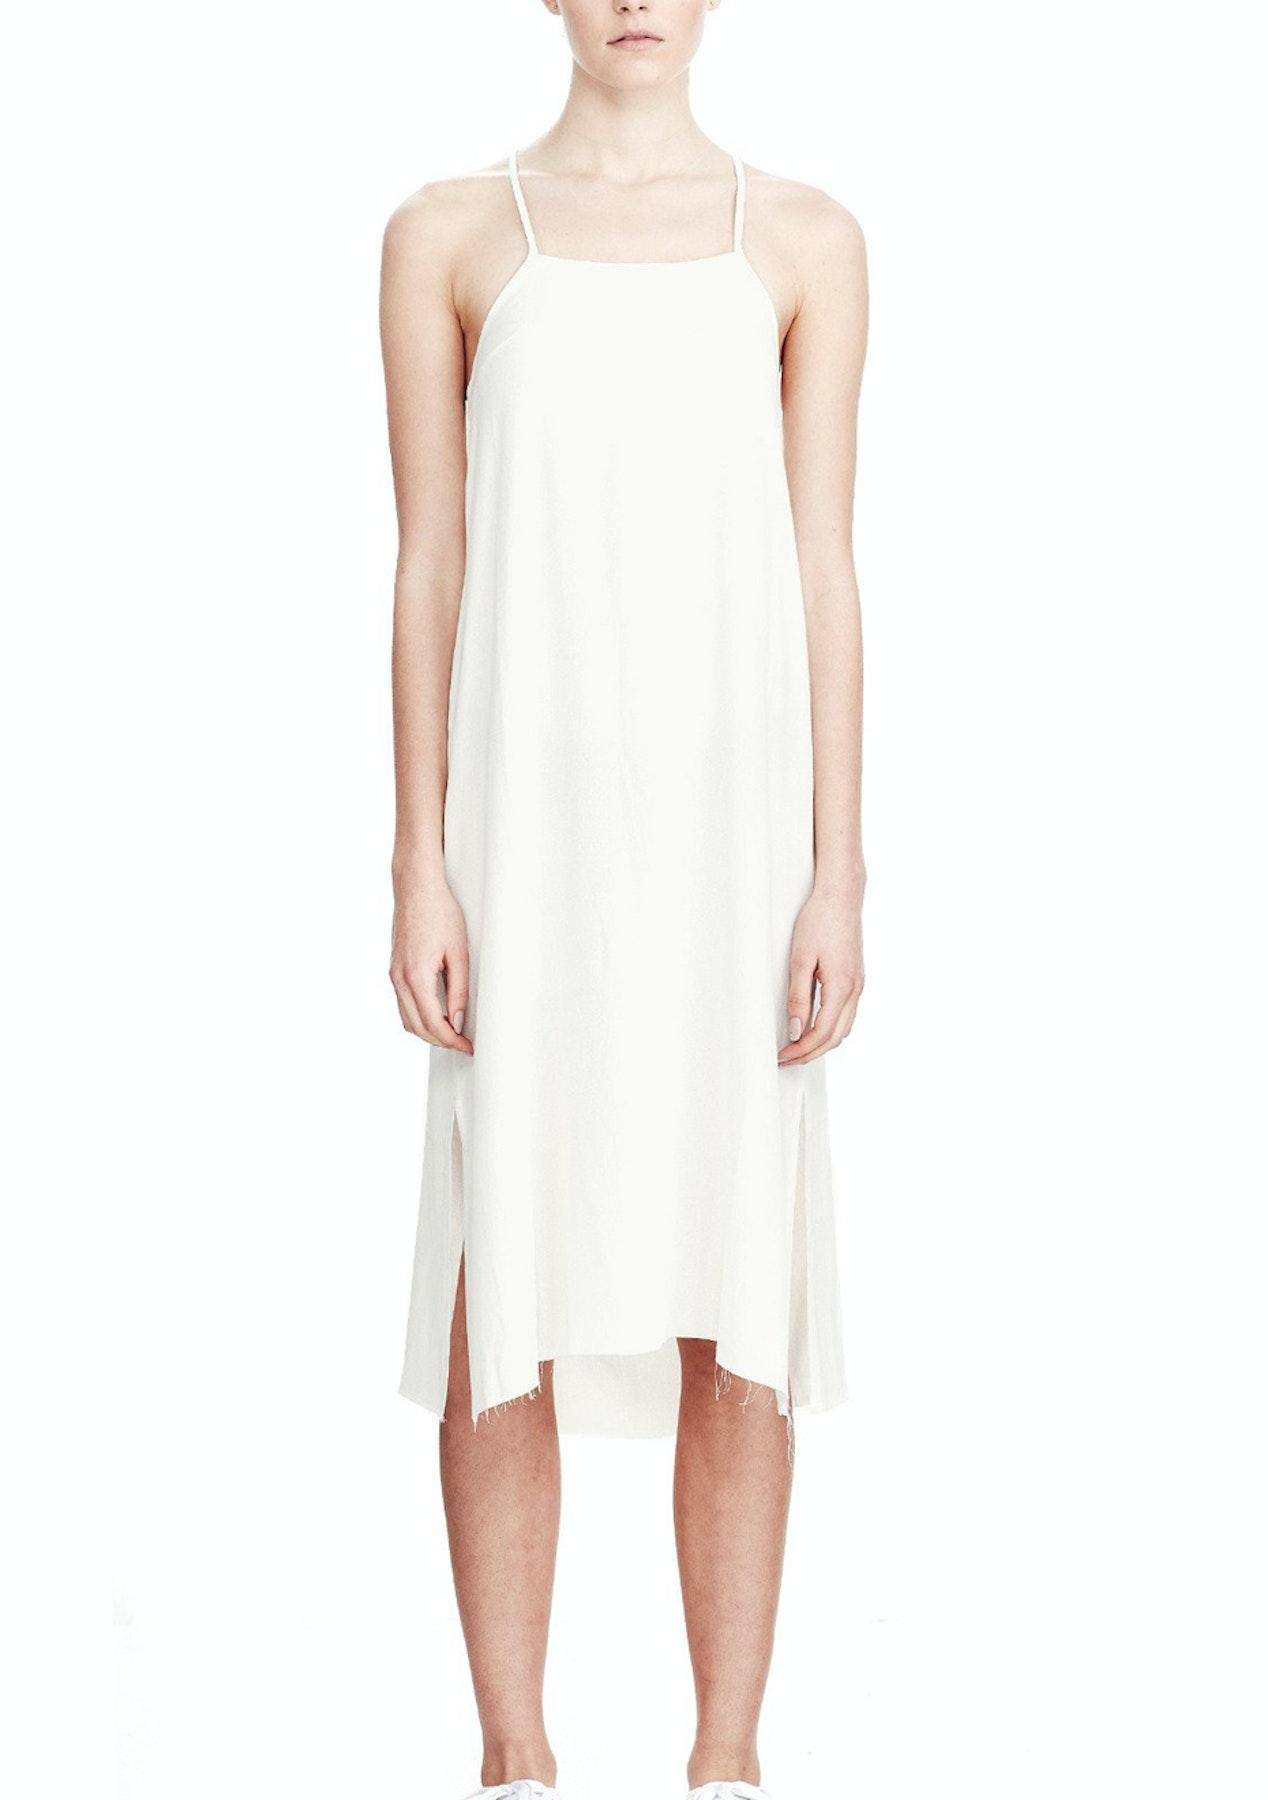 Commoners - Crossover Slip Dress - Ivory - Designer Fashion Brands ...